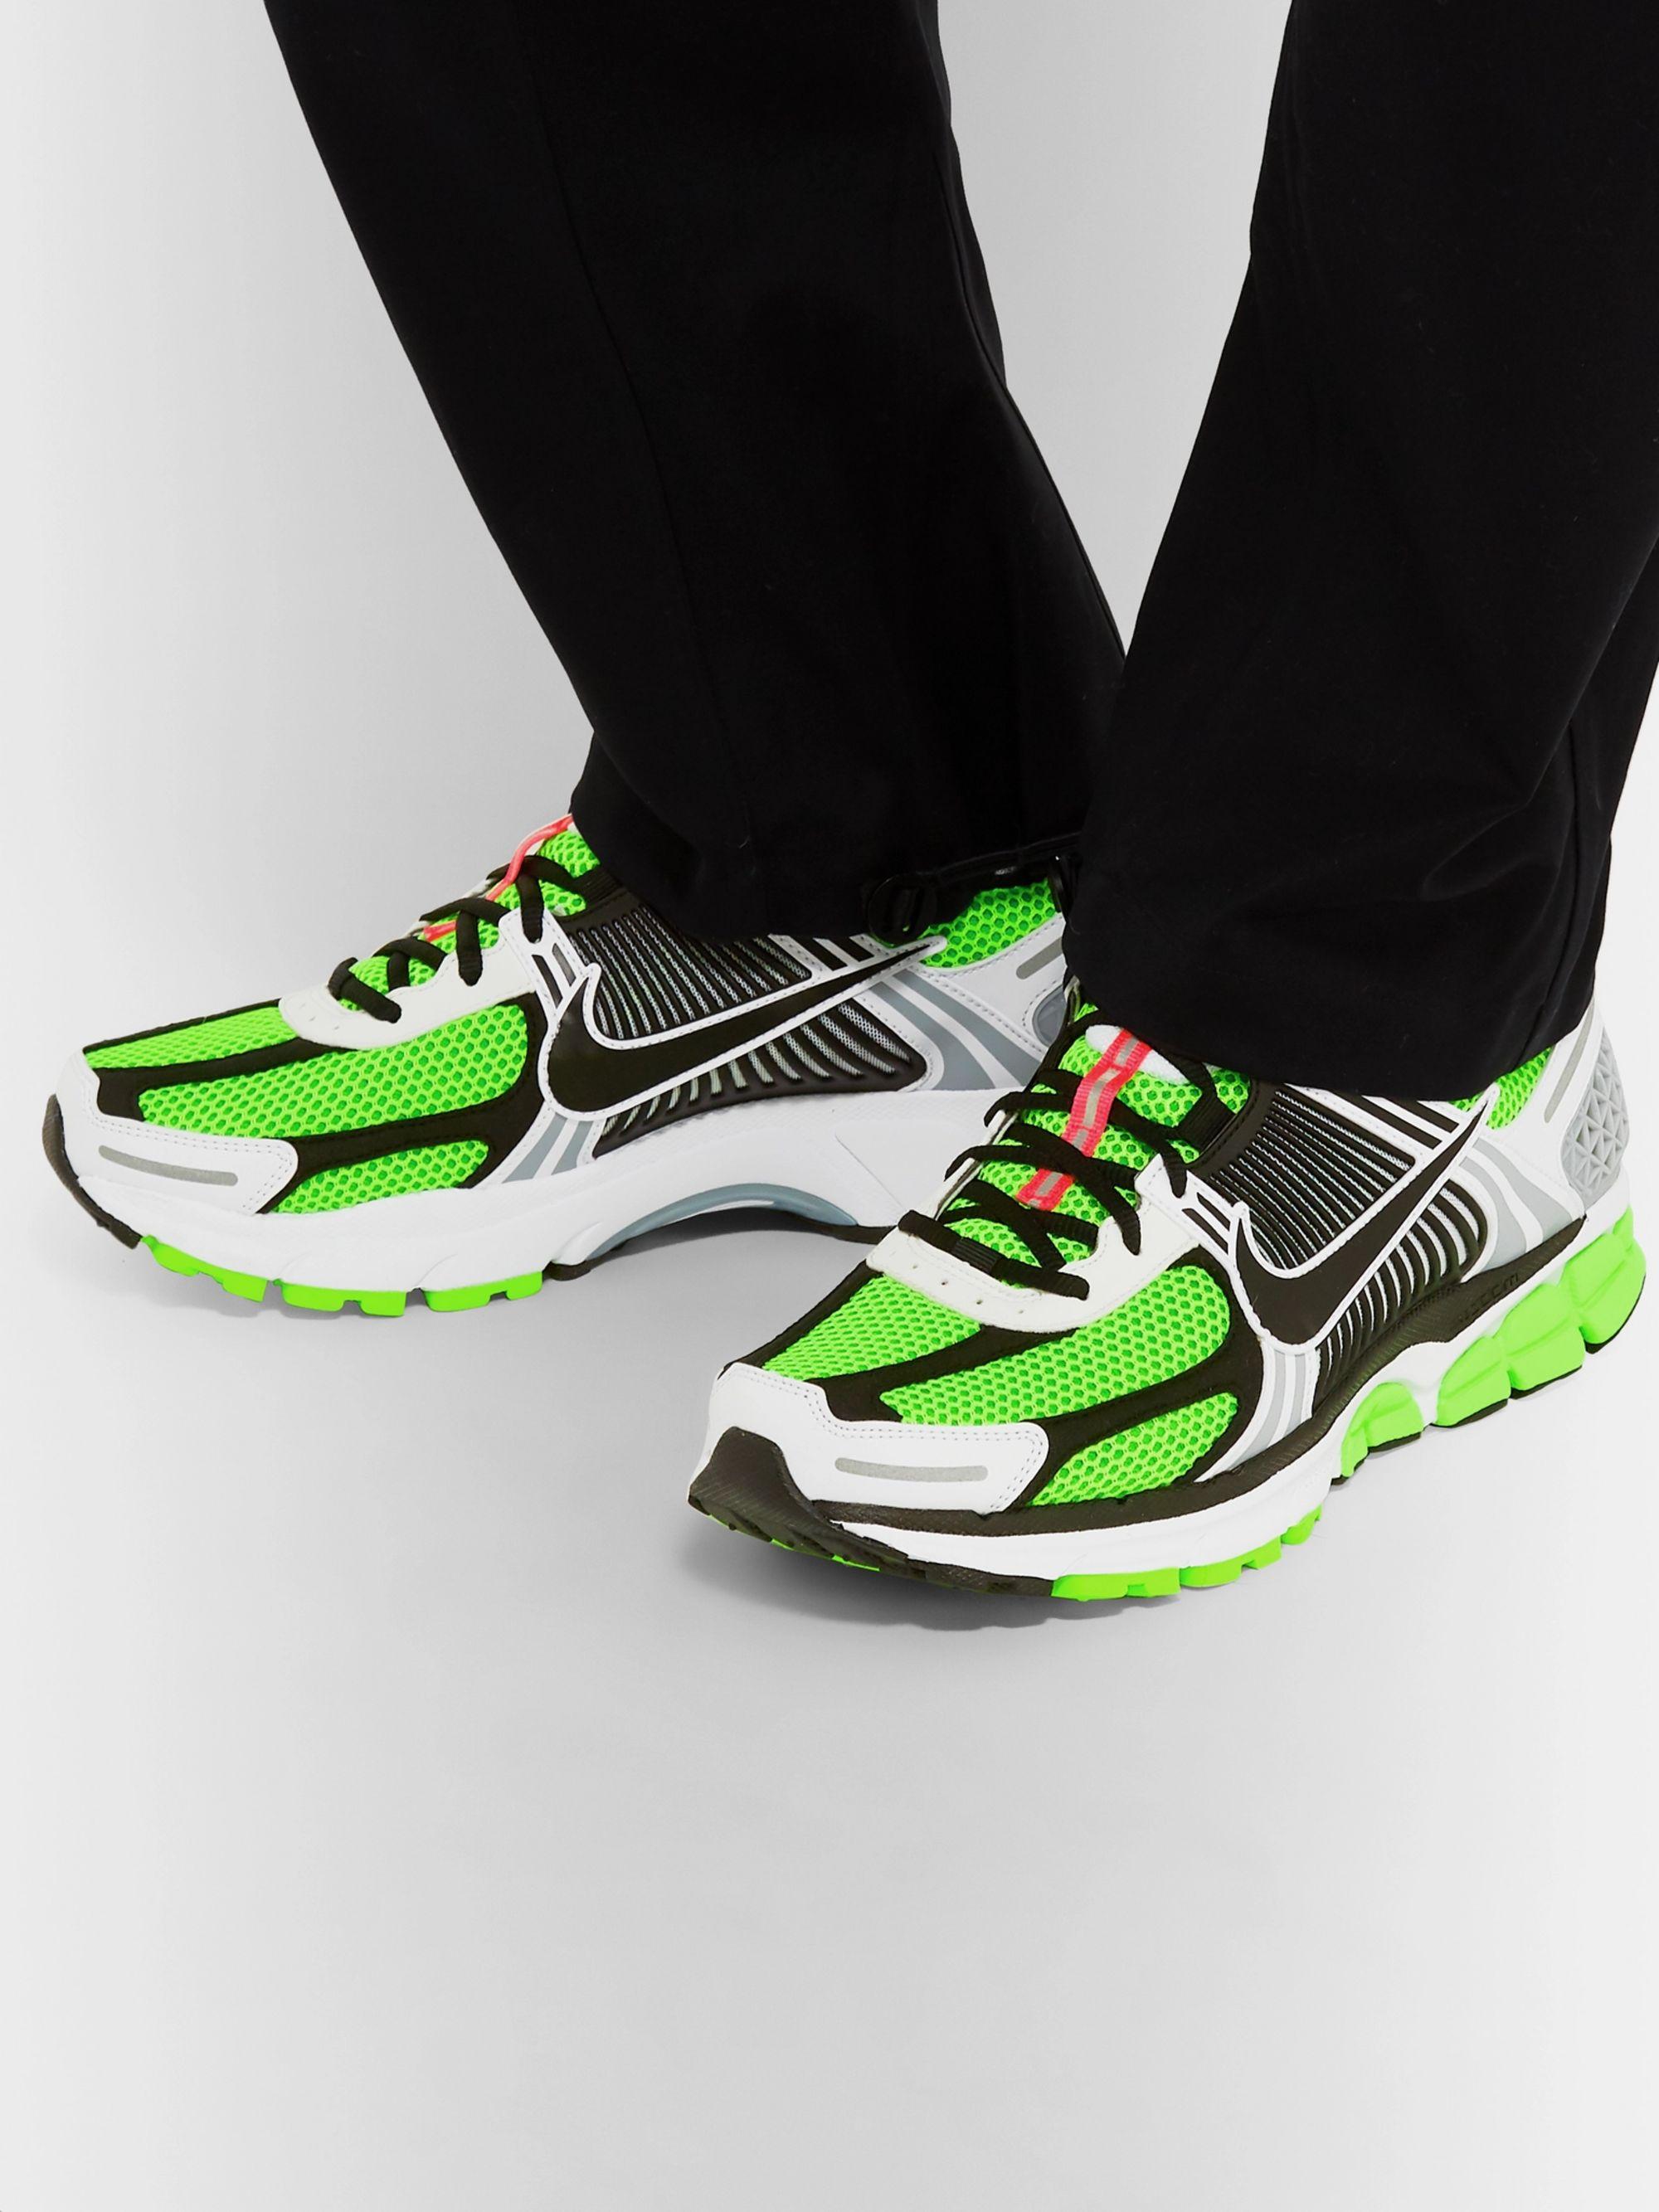 ConceptsIntl | Nike Zoom Vomero 5 SE SP (Electric Green